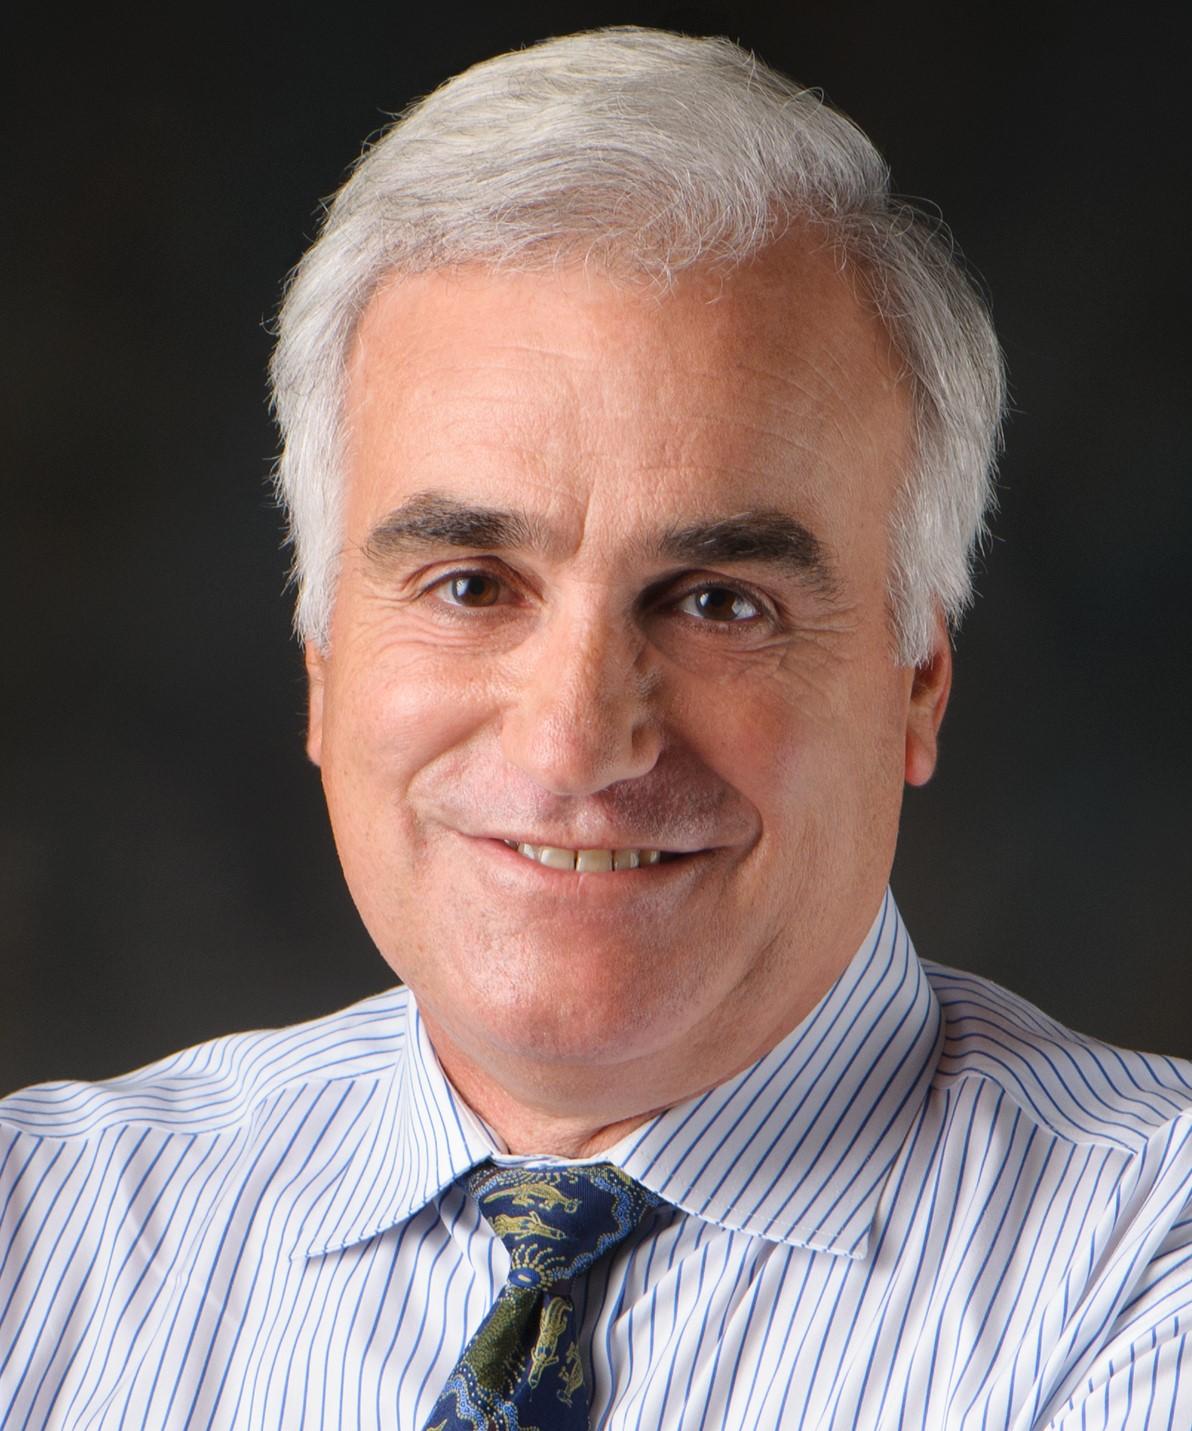 L. Jeffrey Medeiros, M.D.